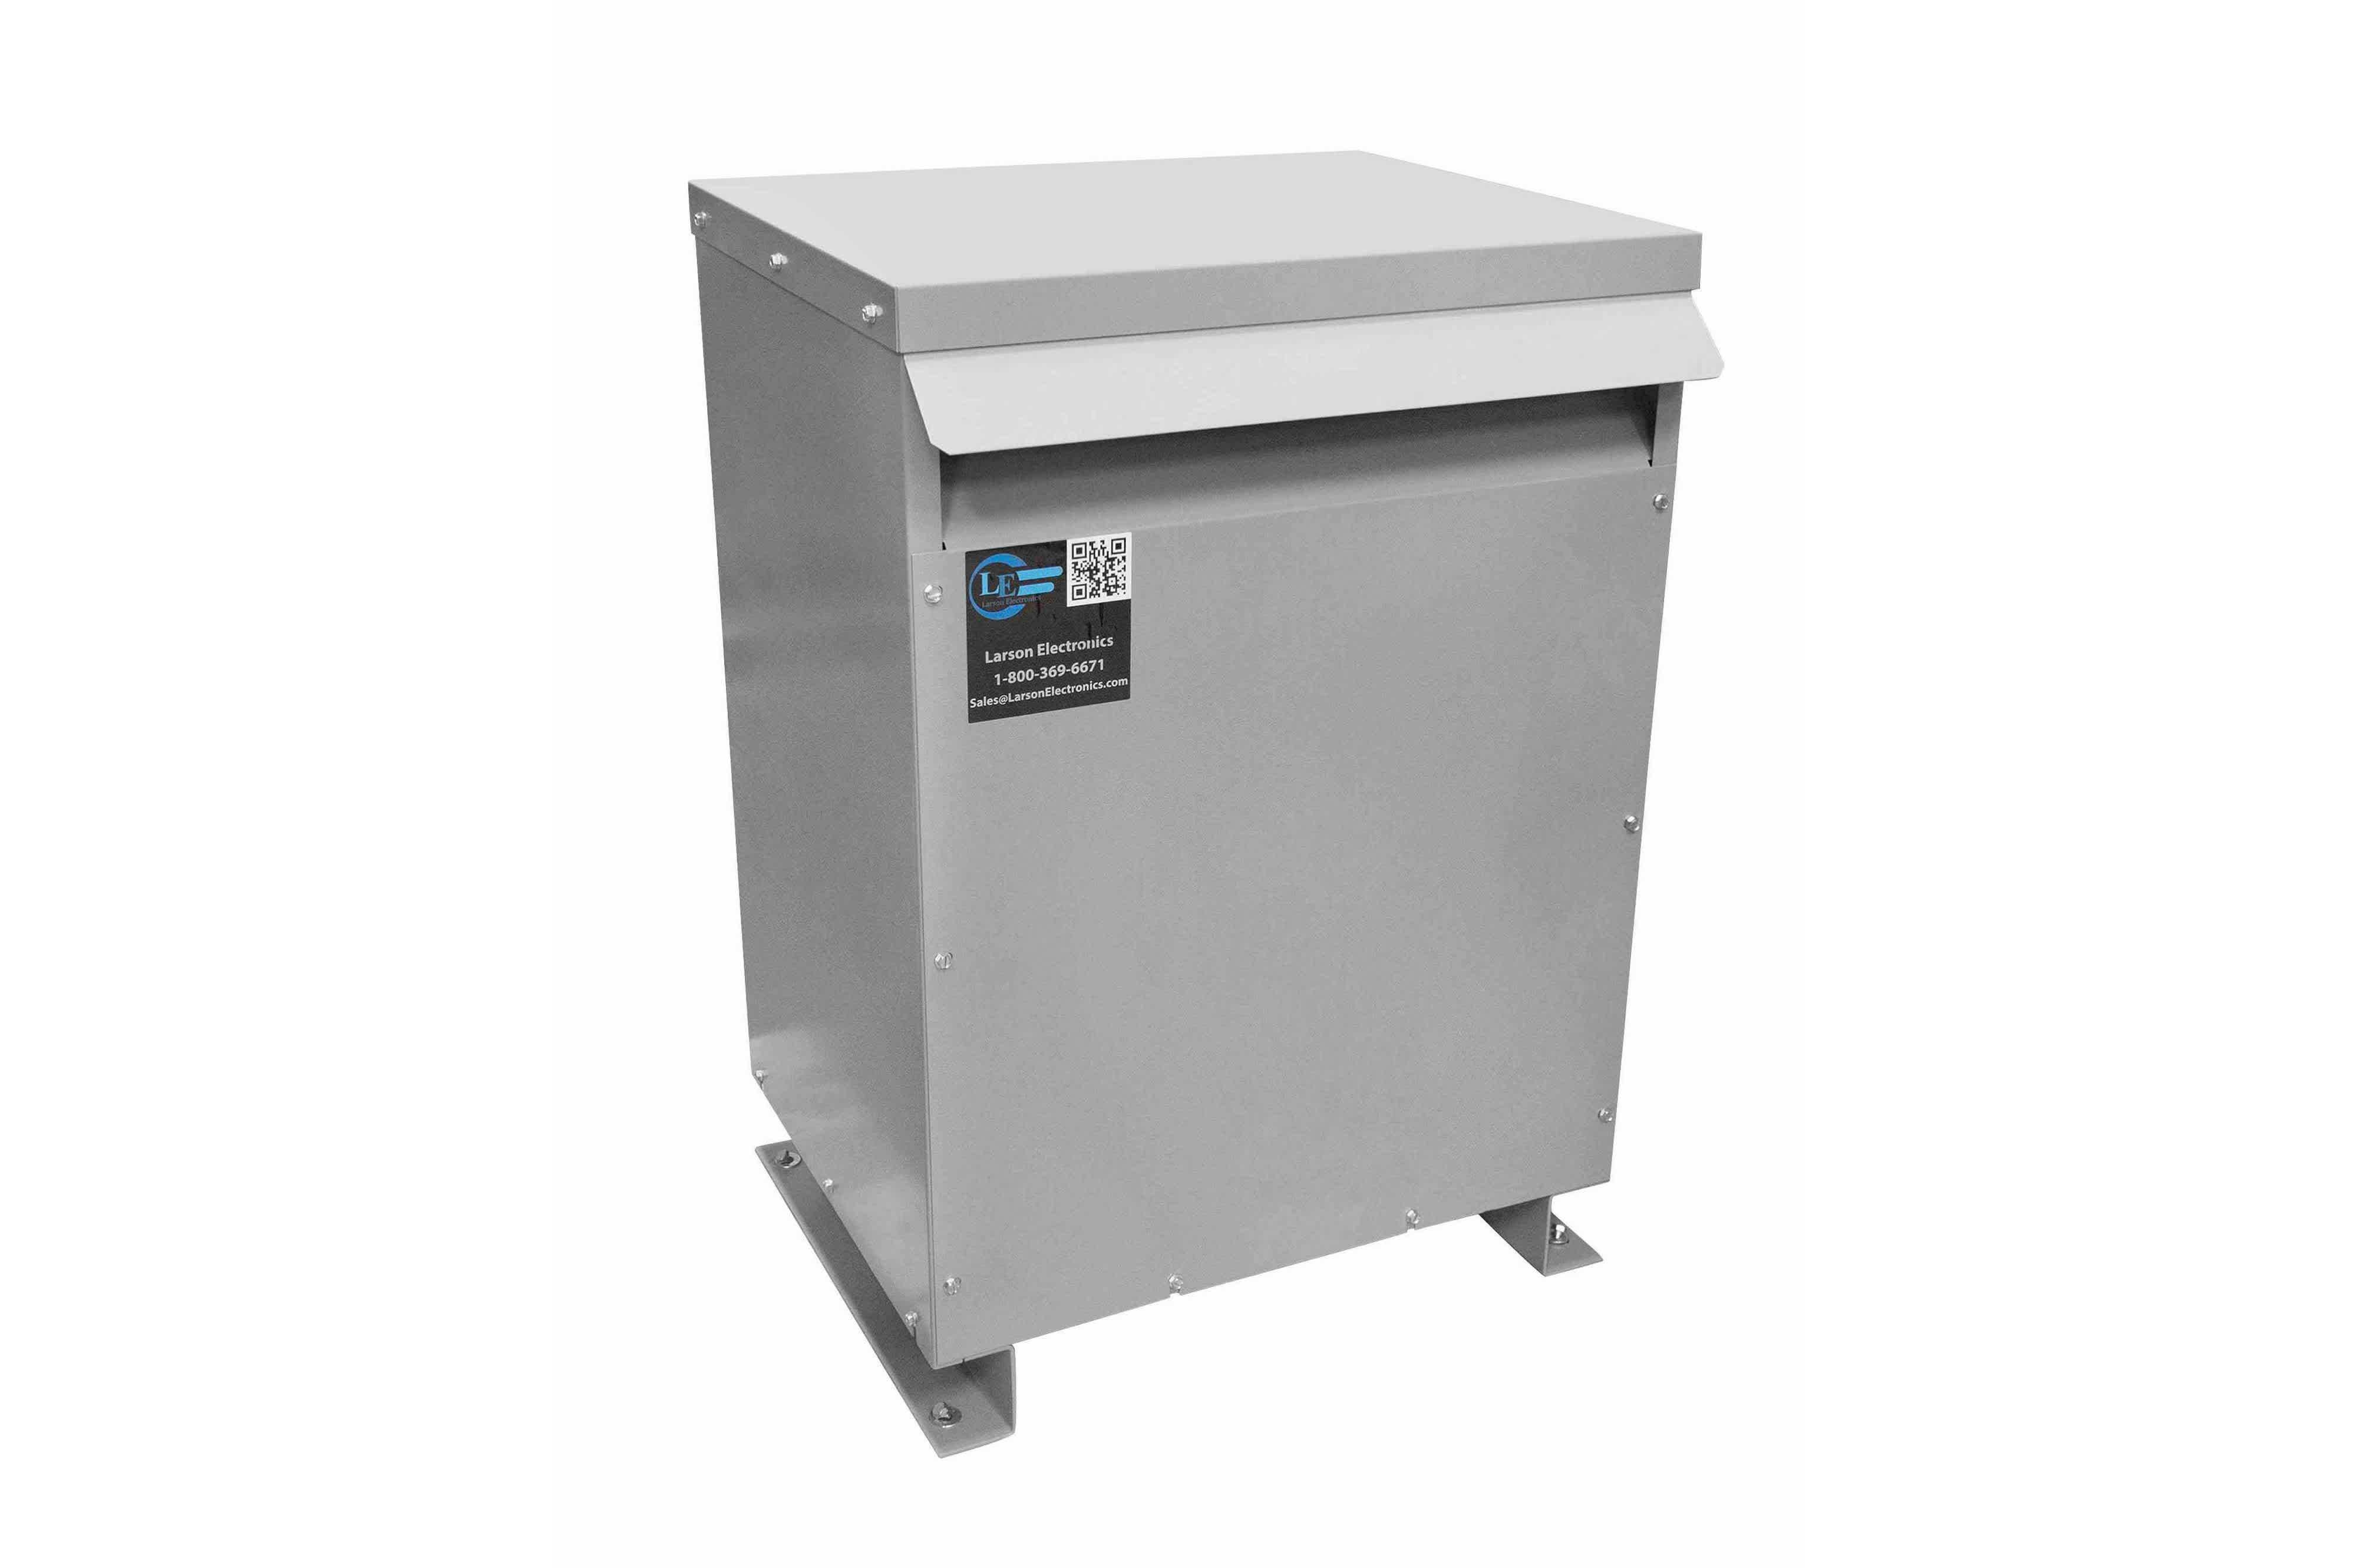 800 kVA 3PH DOE Transformer, 208V Delta Primary, 600Y/347 Wye-N Secondary, N3R, Ventilated, 60 Hz